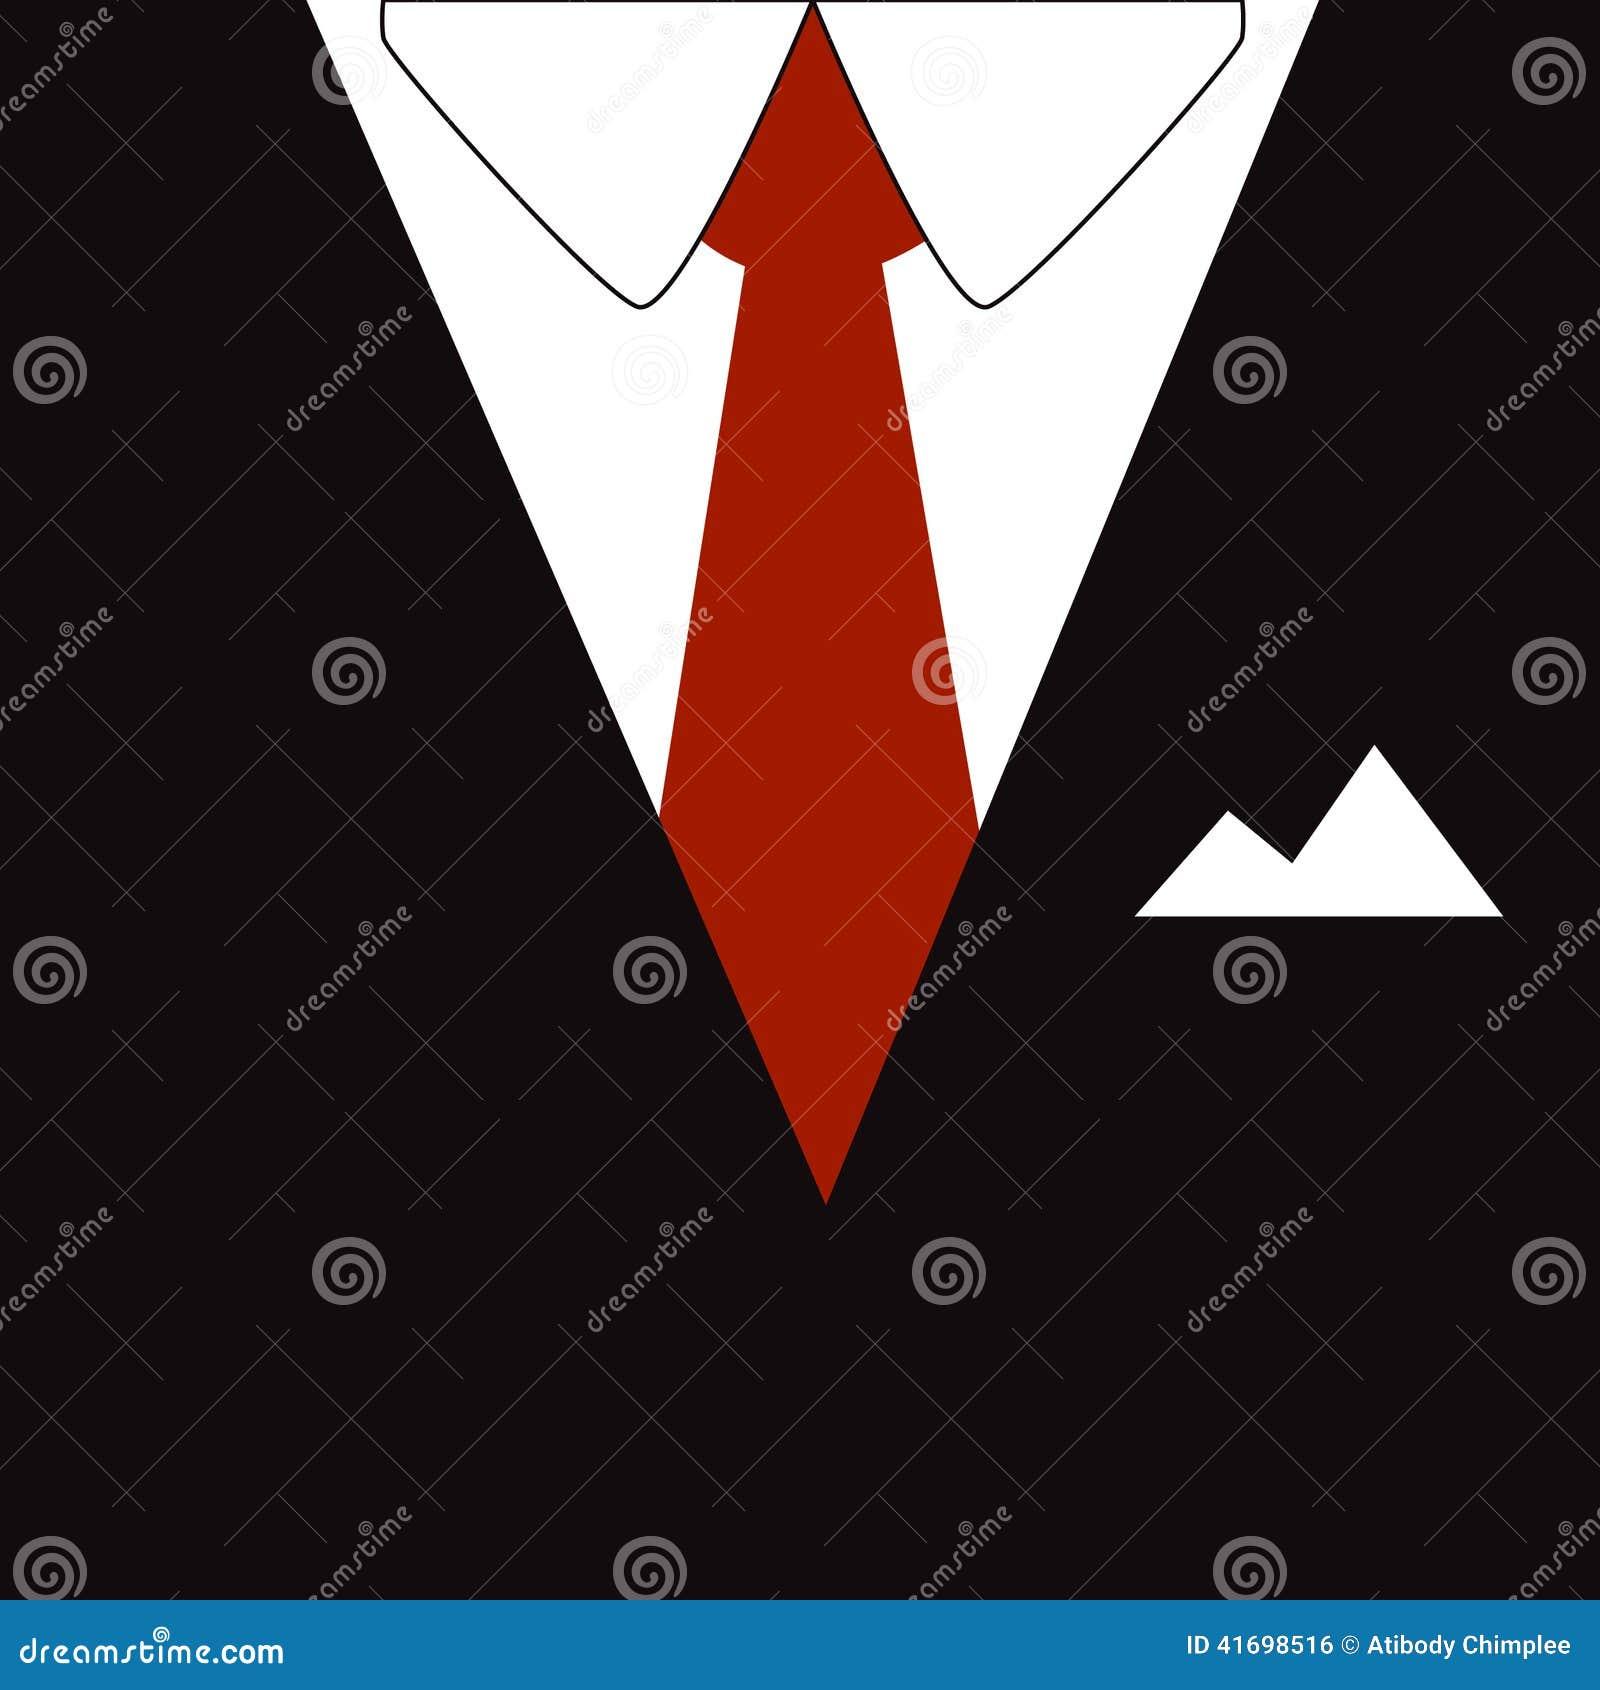 black tie wikipedia the free encyclopedia talkblack tie